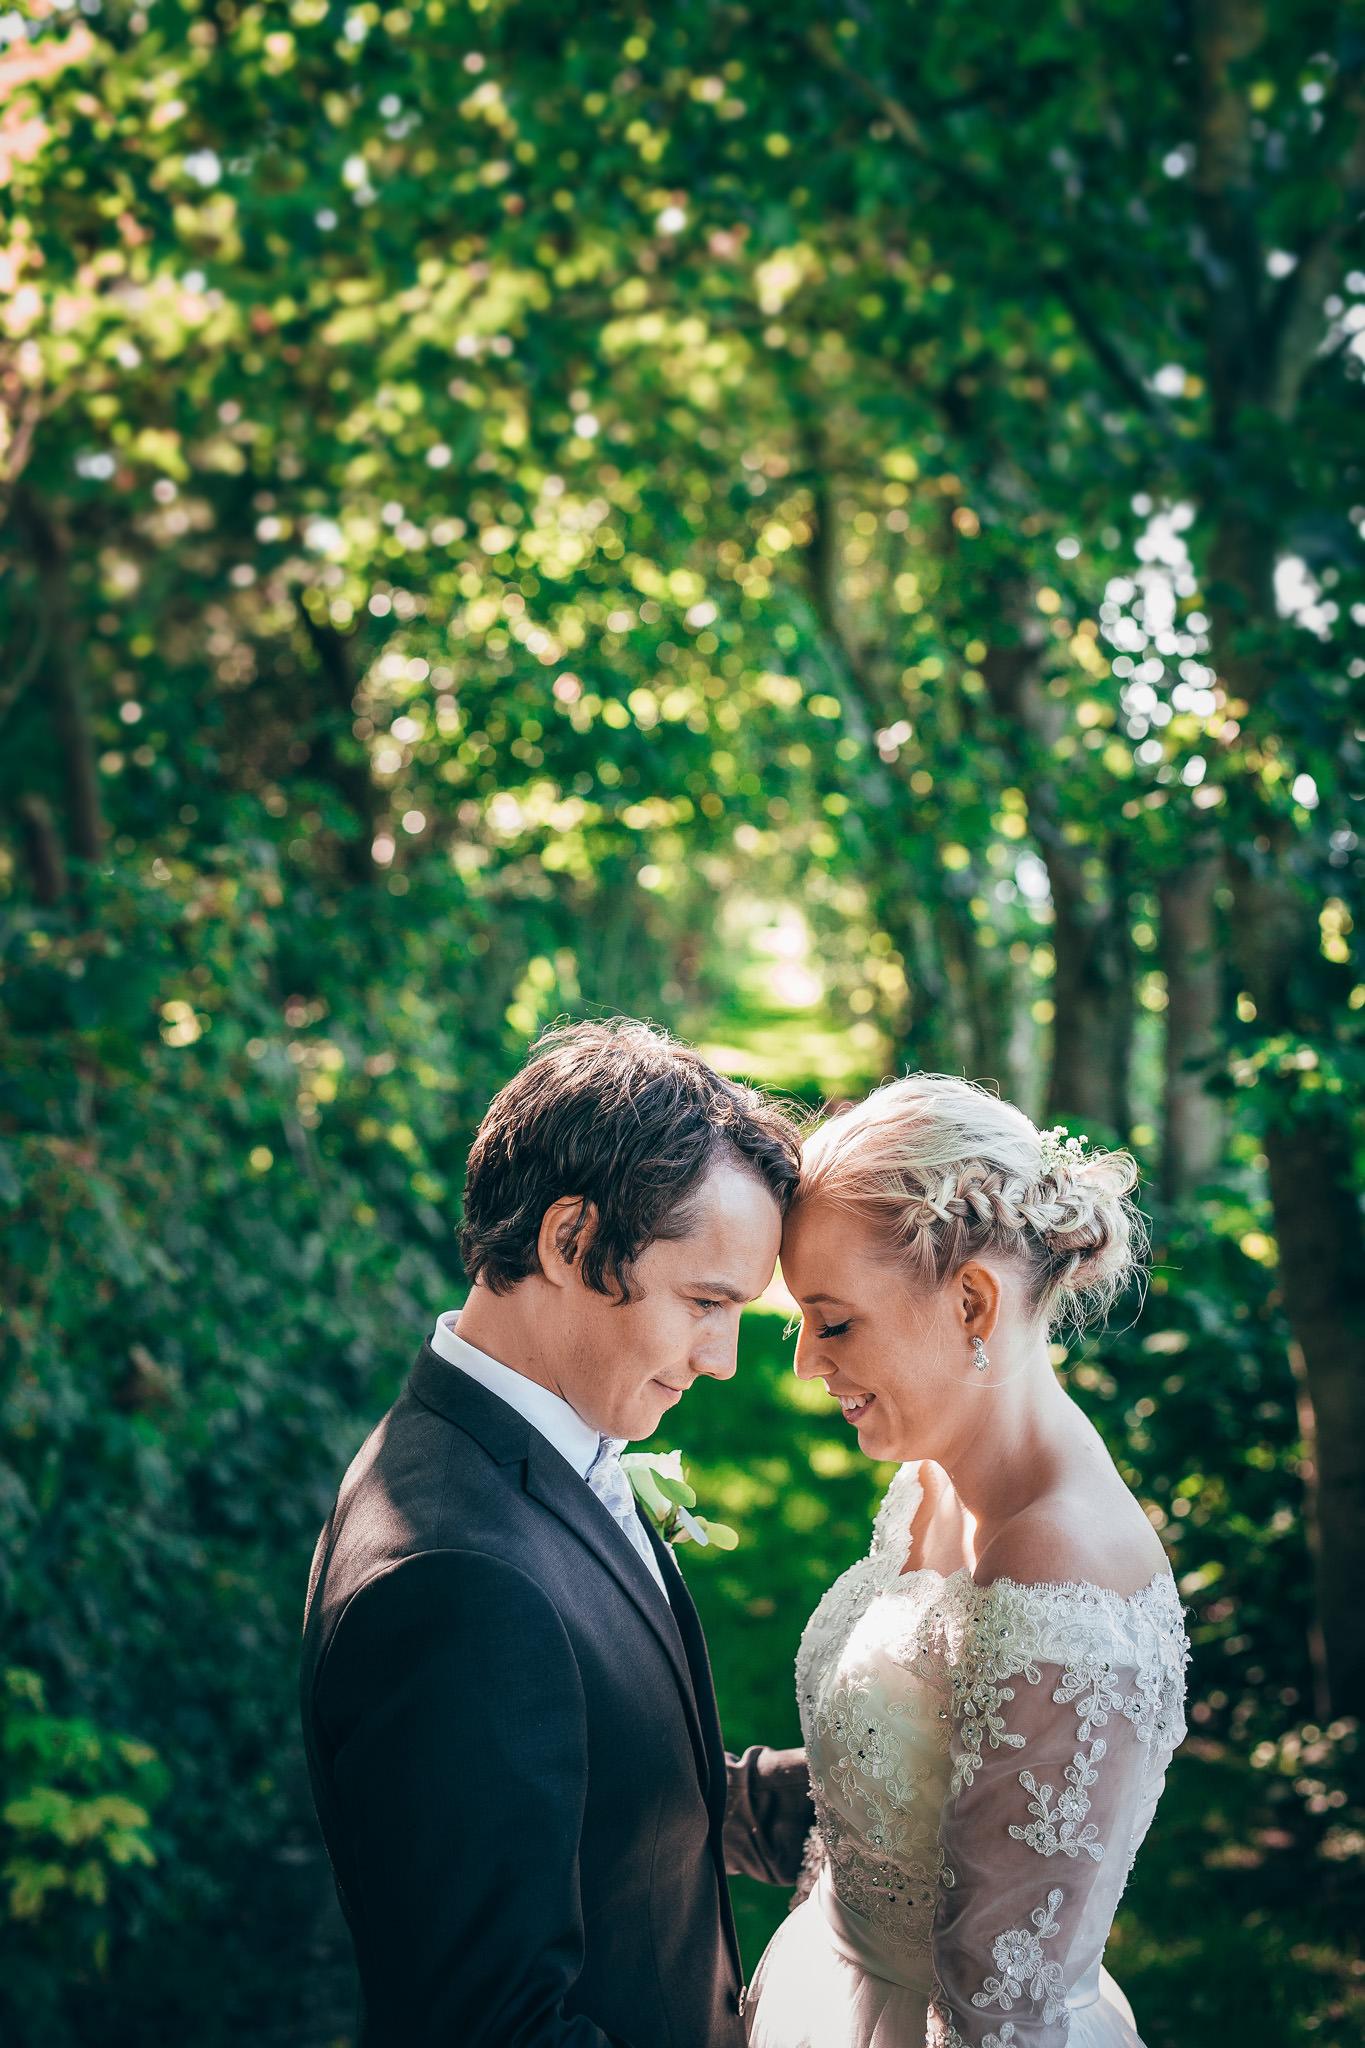 Wedding+Photographer+Norway+Bryllupsfotograf+Casey+Arneson+JT-101.jpg